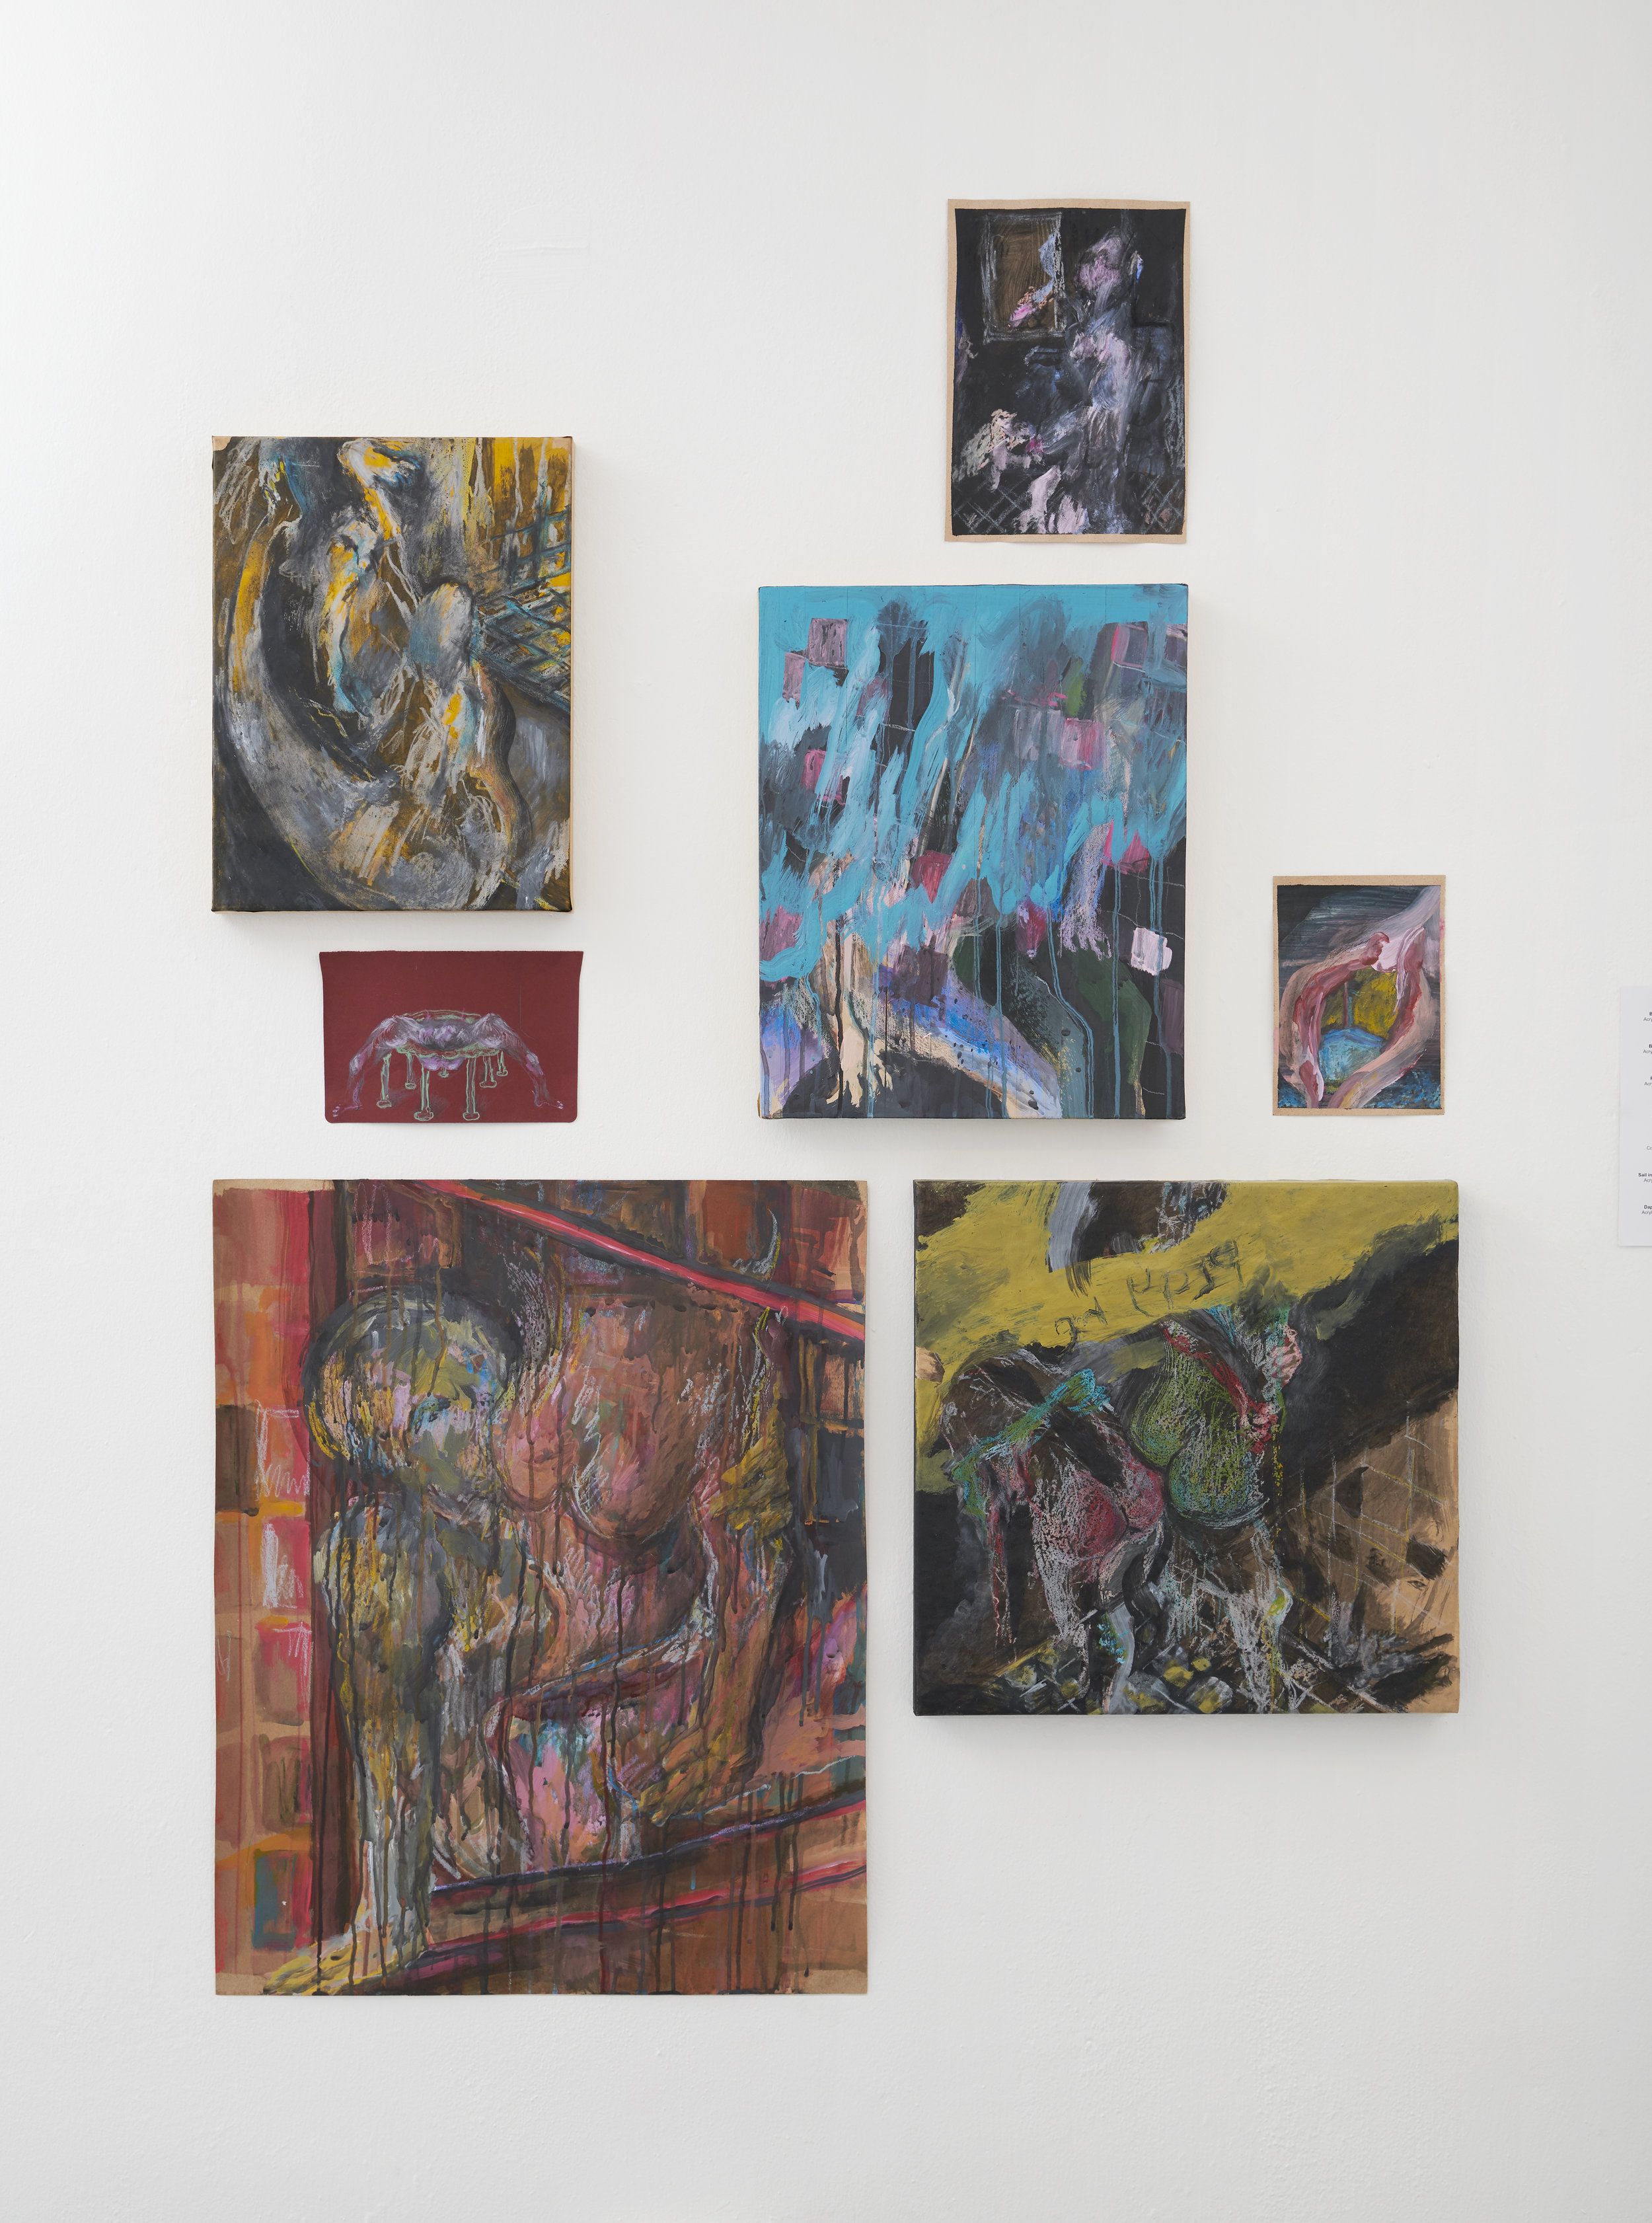 Various Works, Aisha Rosli 2018, Installation View at Coda Culture